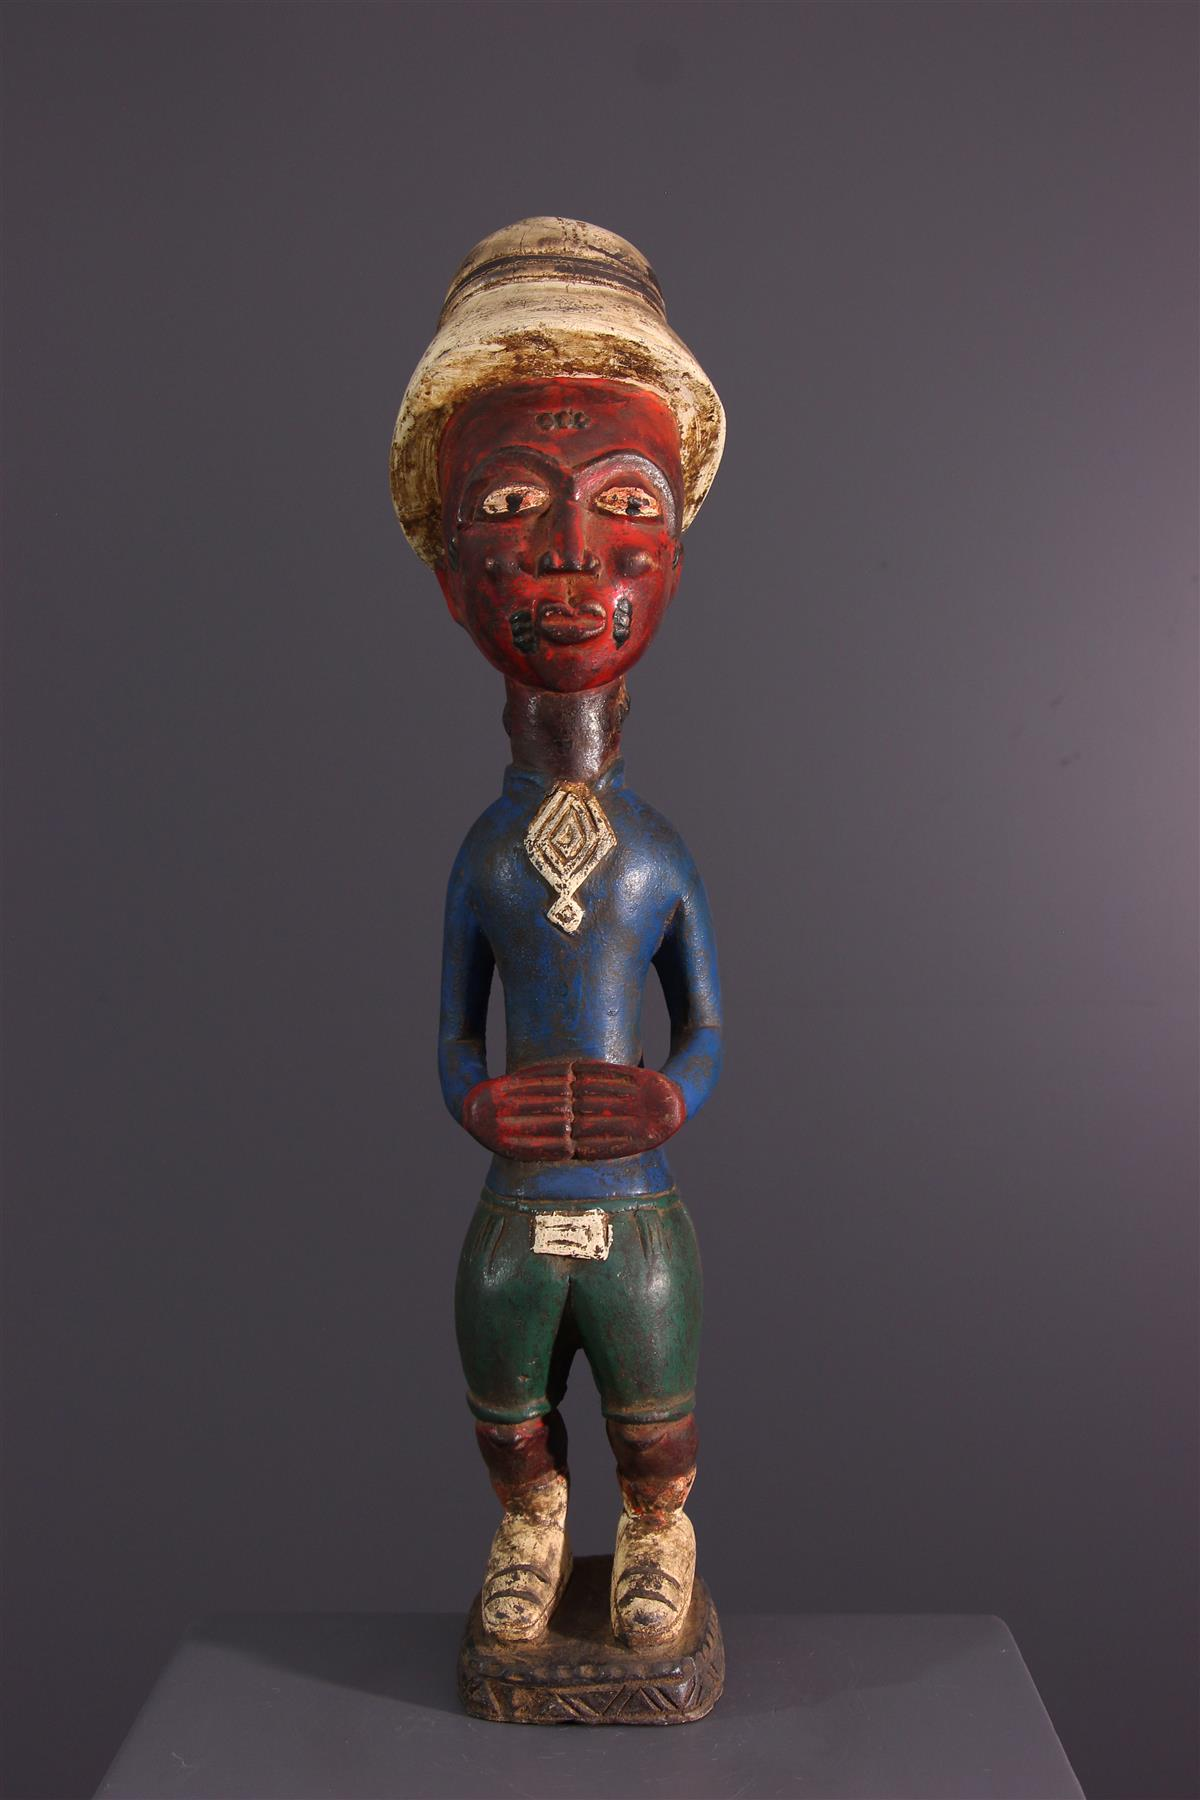 Colon Baoulé - African art